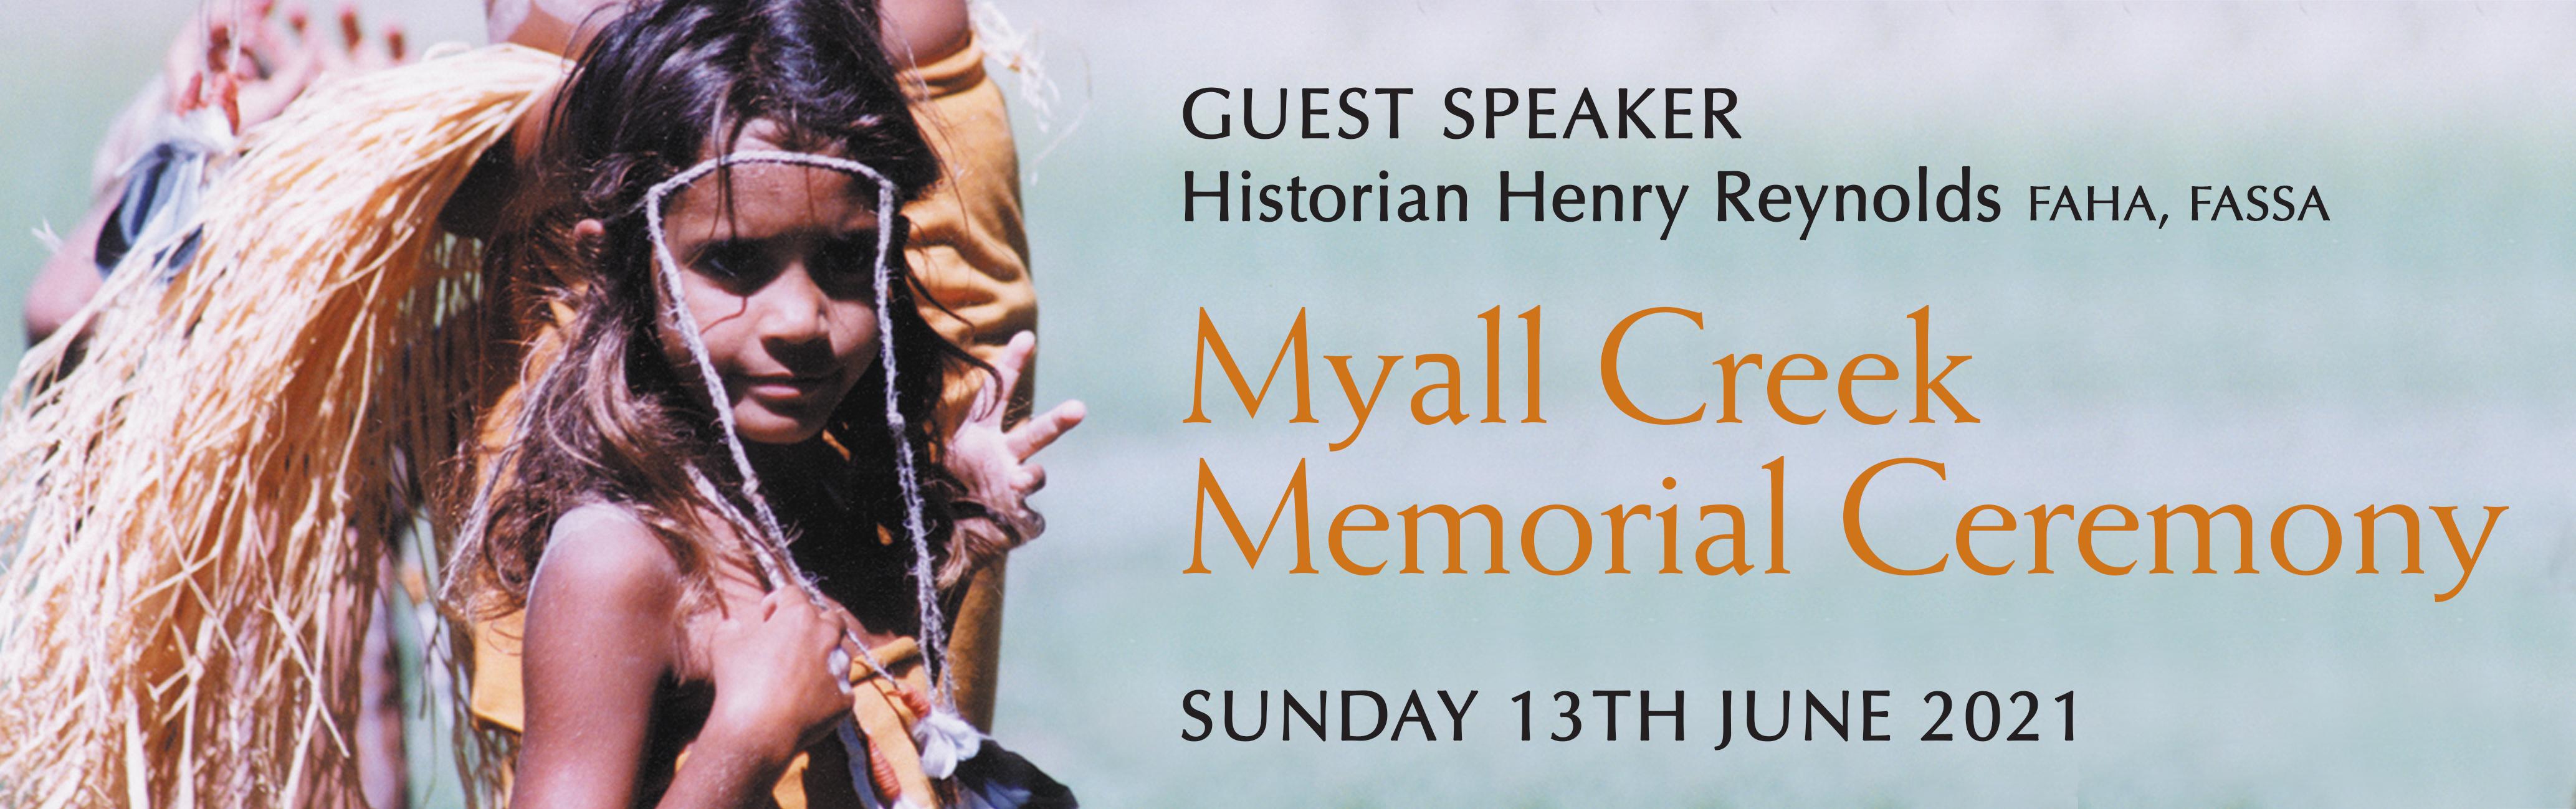 Myall Creek Memorial Ceremony 2021